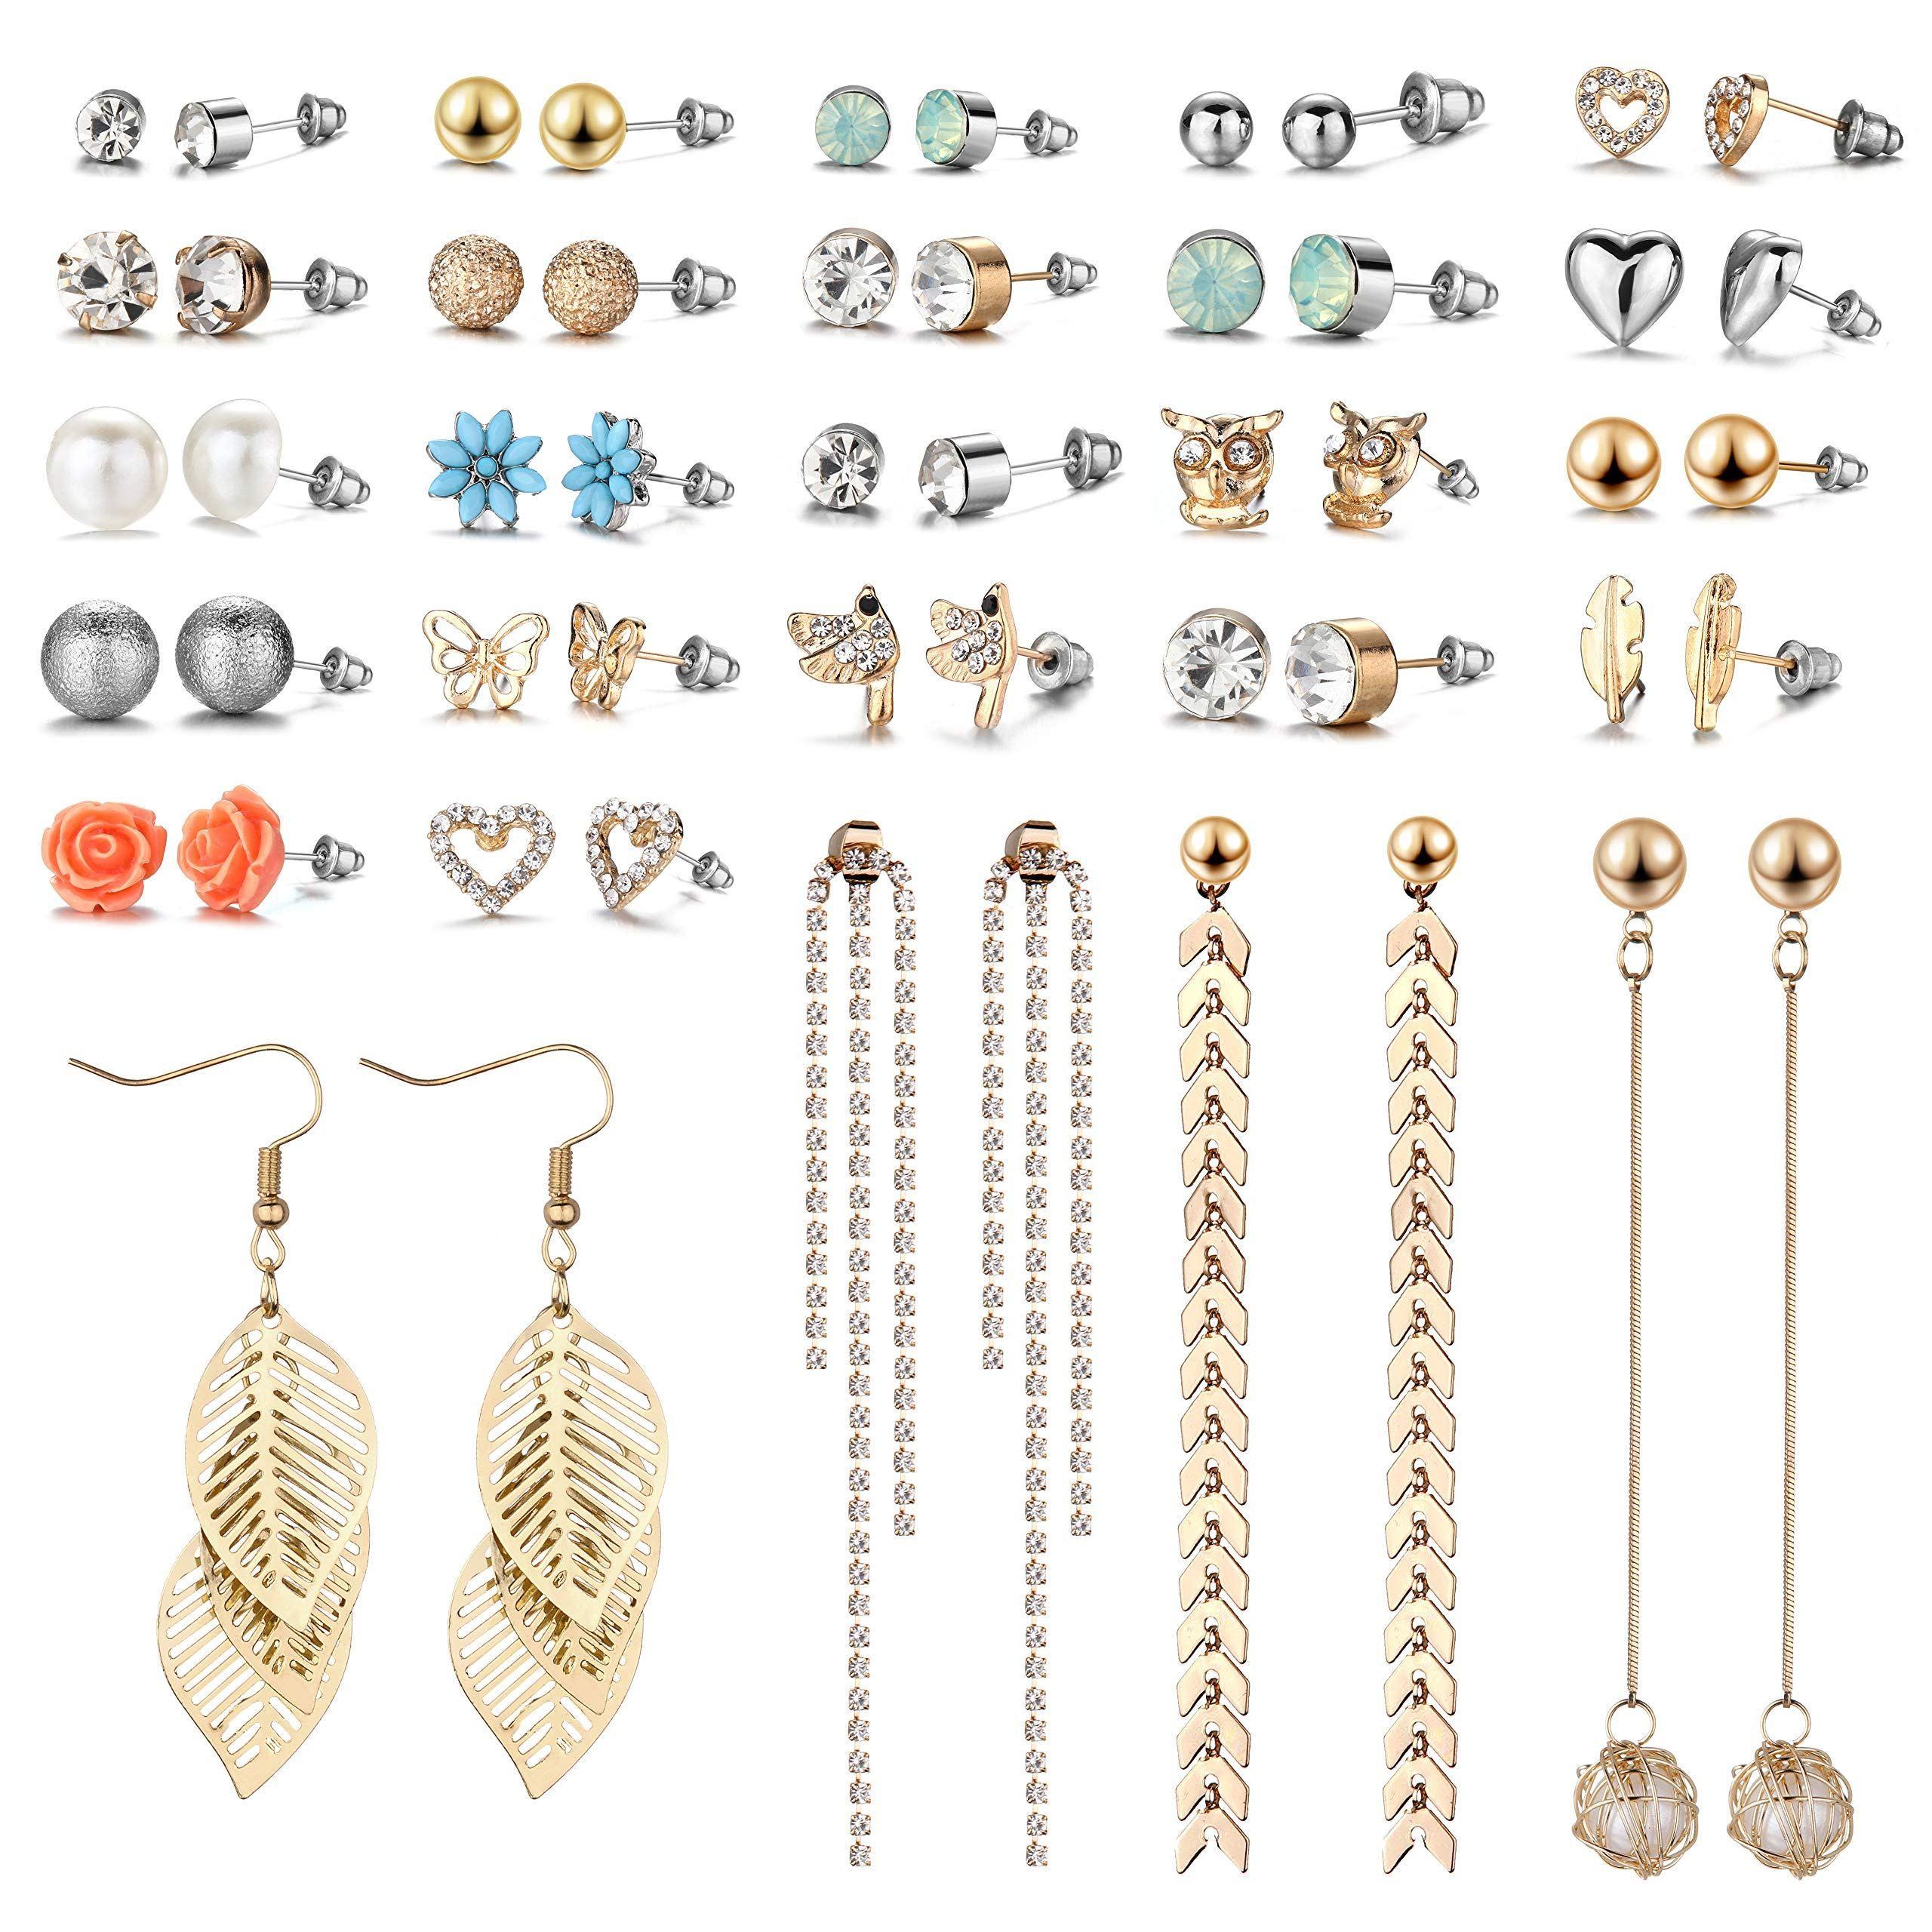 hoops hoops earrings sapphire jewelry sapphire earrings boho chic earrings Christmas for her sapphire earrings bohemian earrings